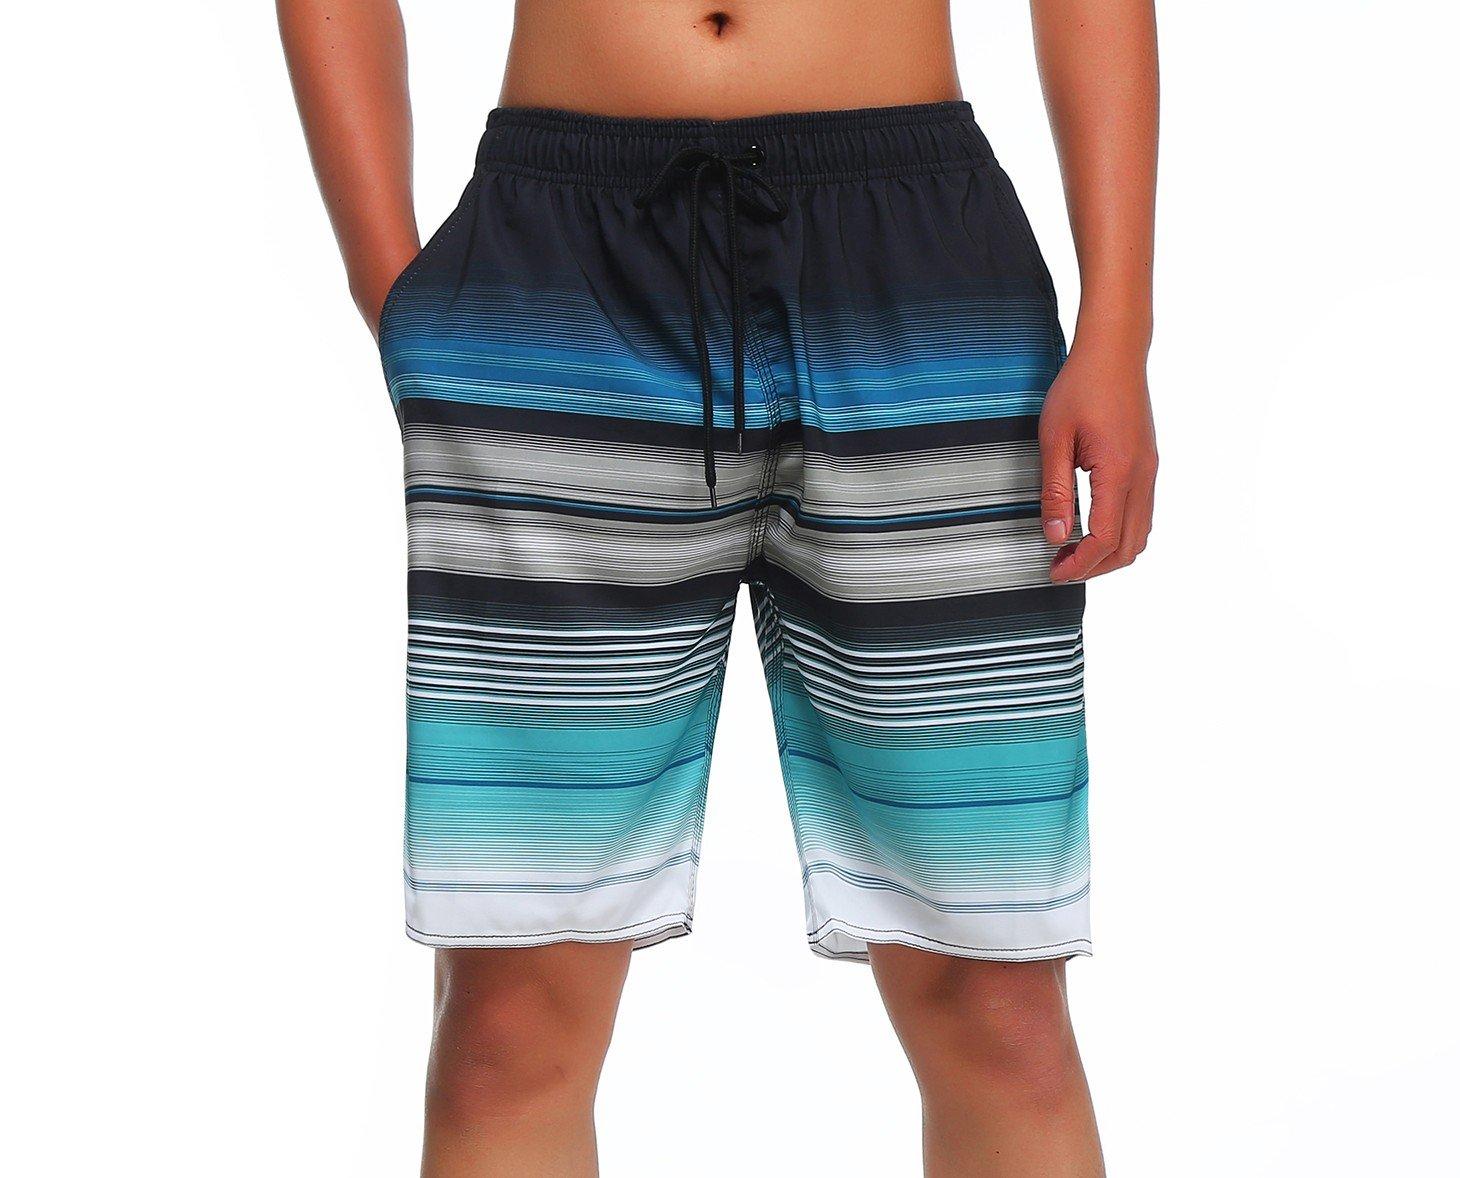 MILANKERR メンズ 水着 サーフパンツ 海水パンツ [UVカット吸汗速乾] B01MS94OJ8 L: ウエスト=96-102cm|ブルー ブルー L: ウエスト=96-102cm